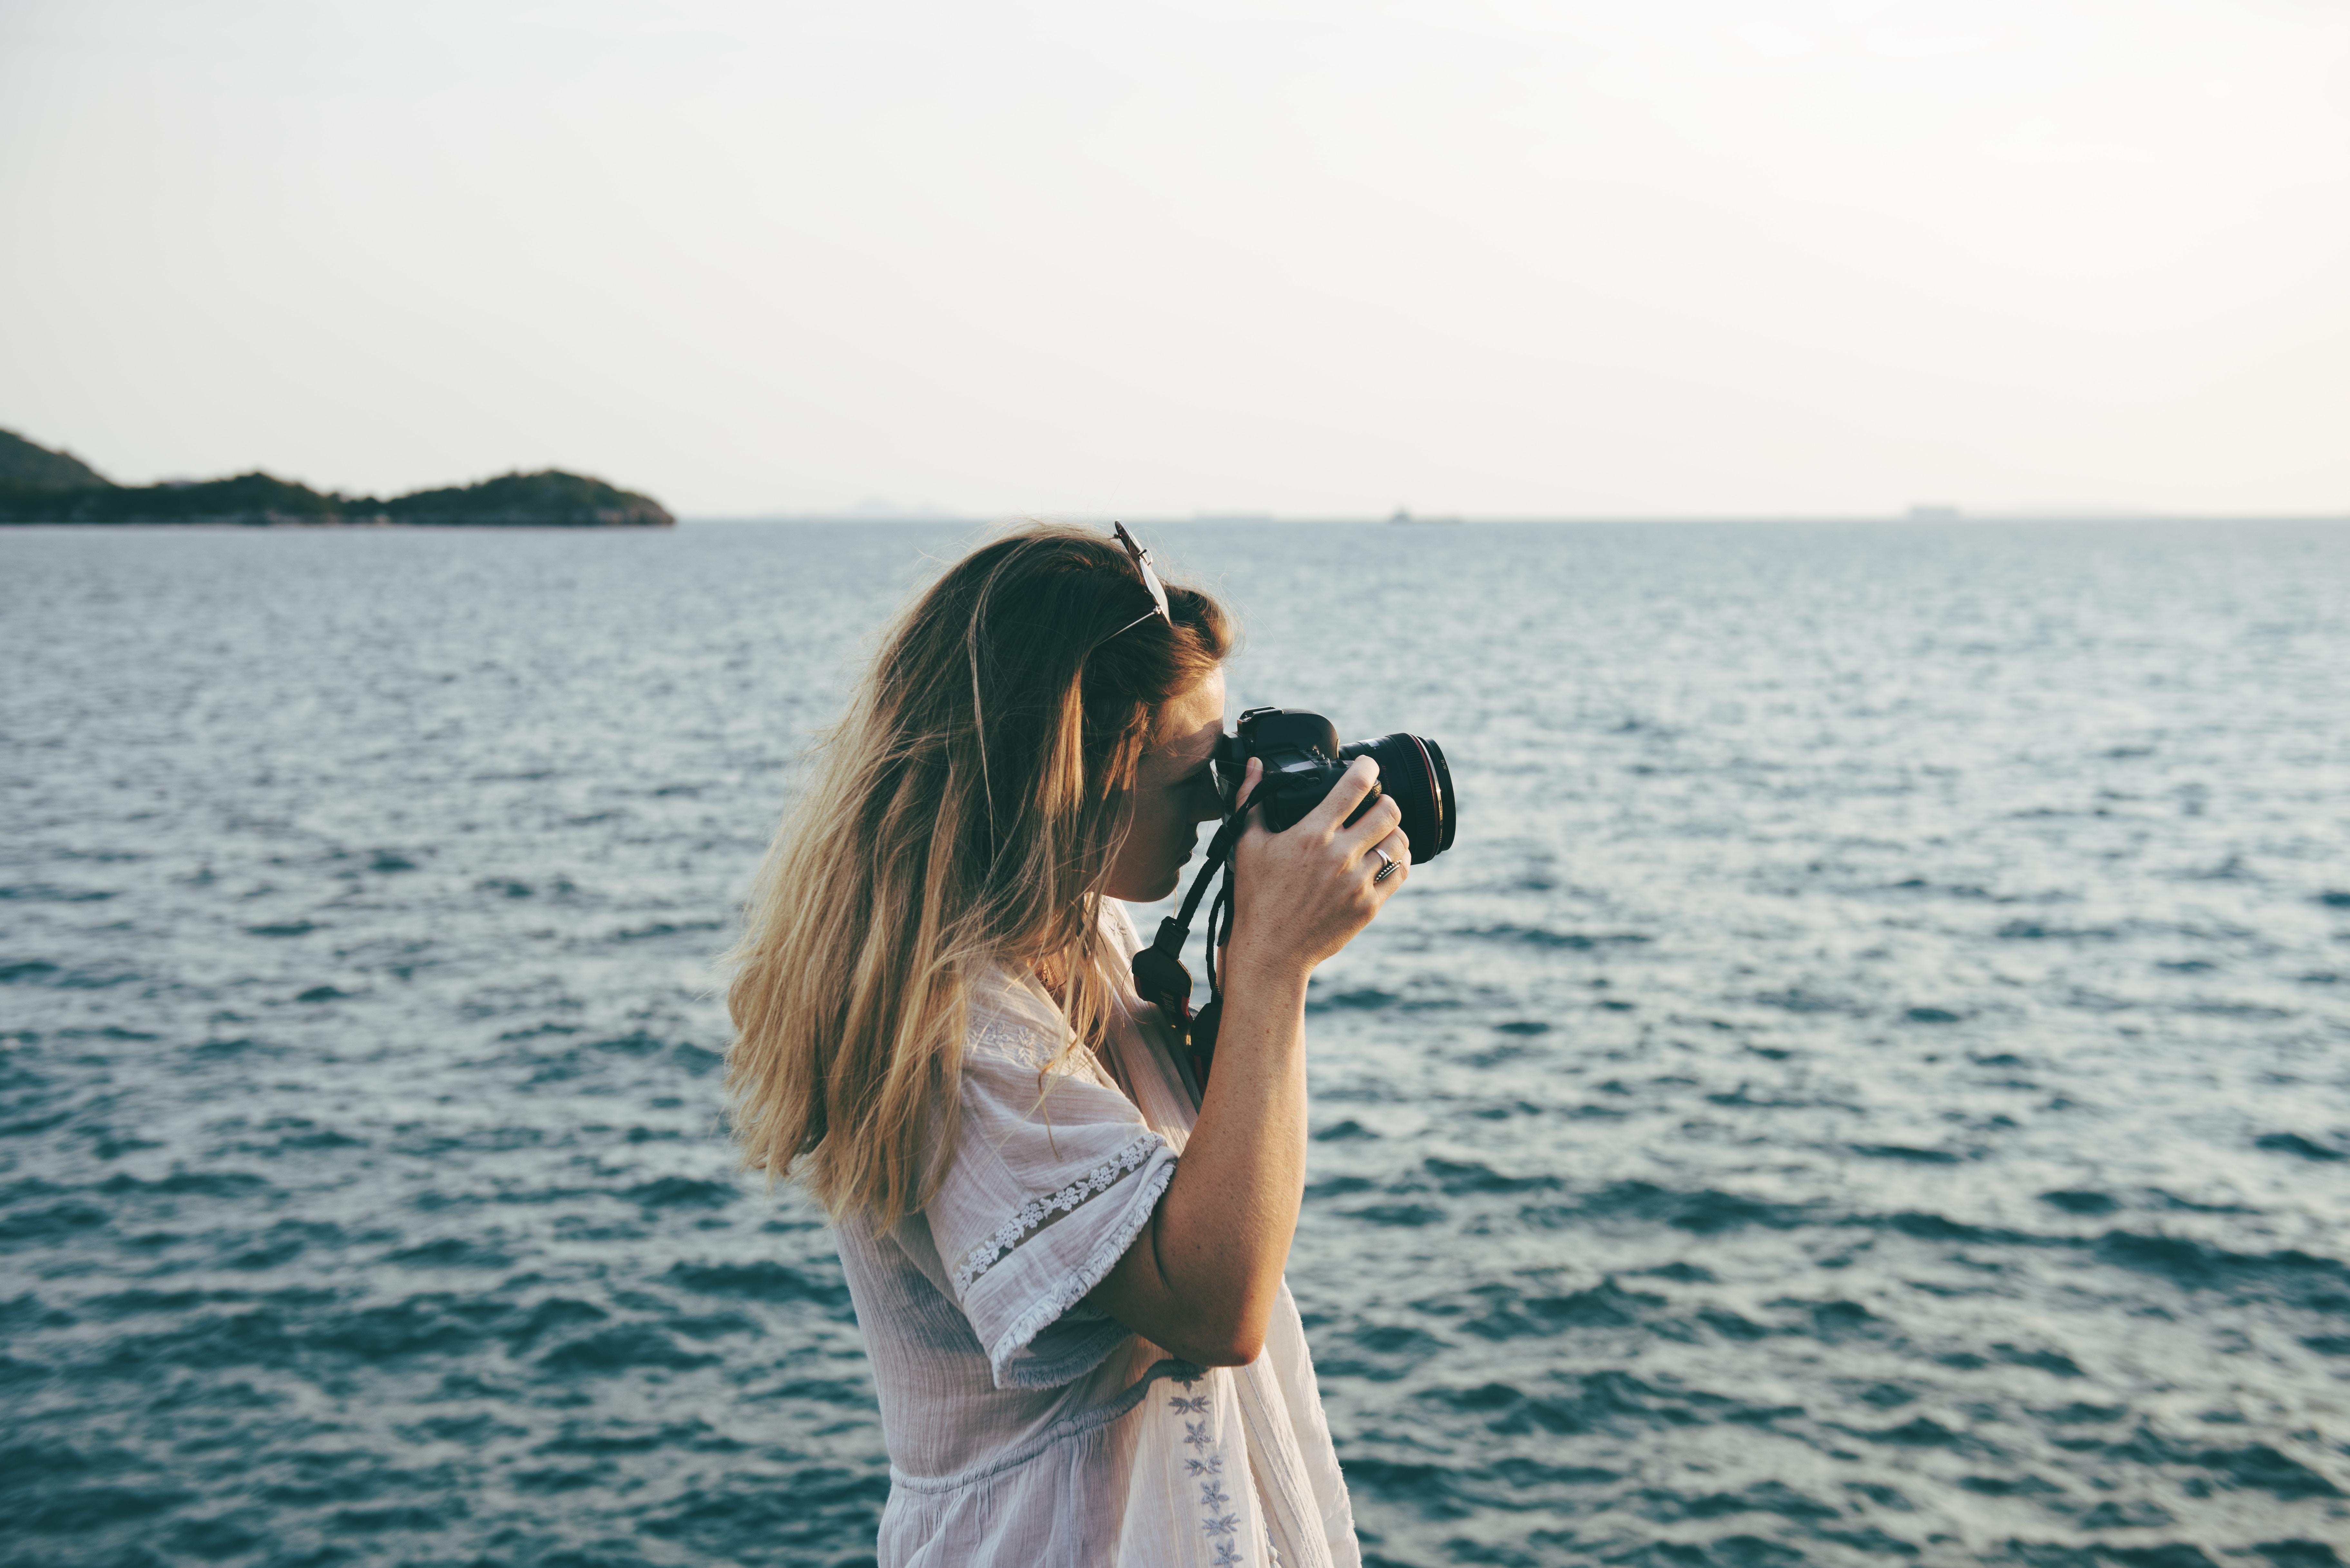 woman taking photo using her DSLR camera